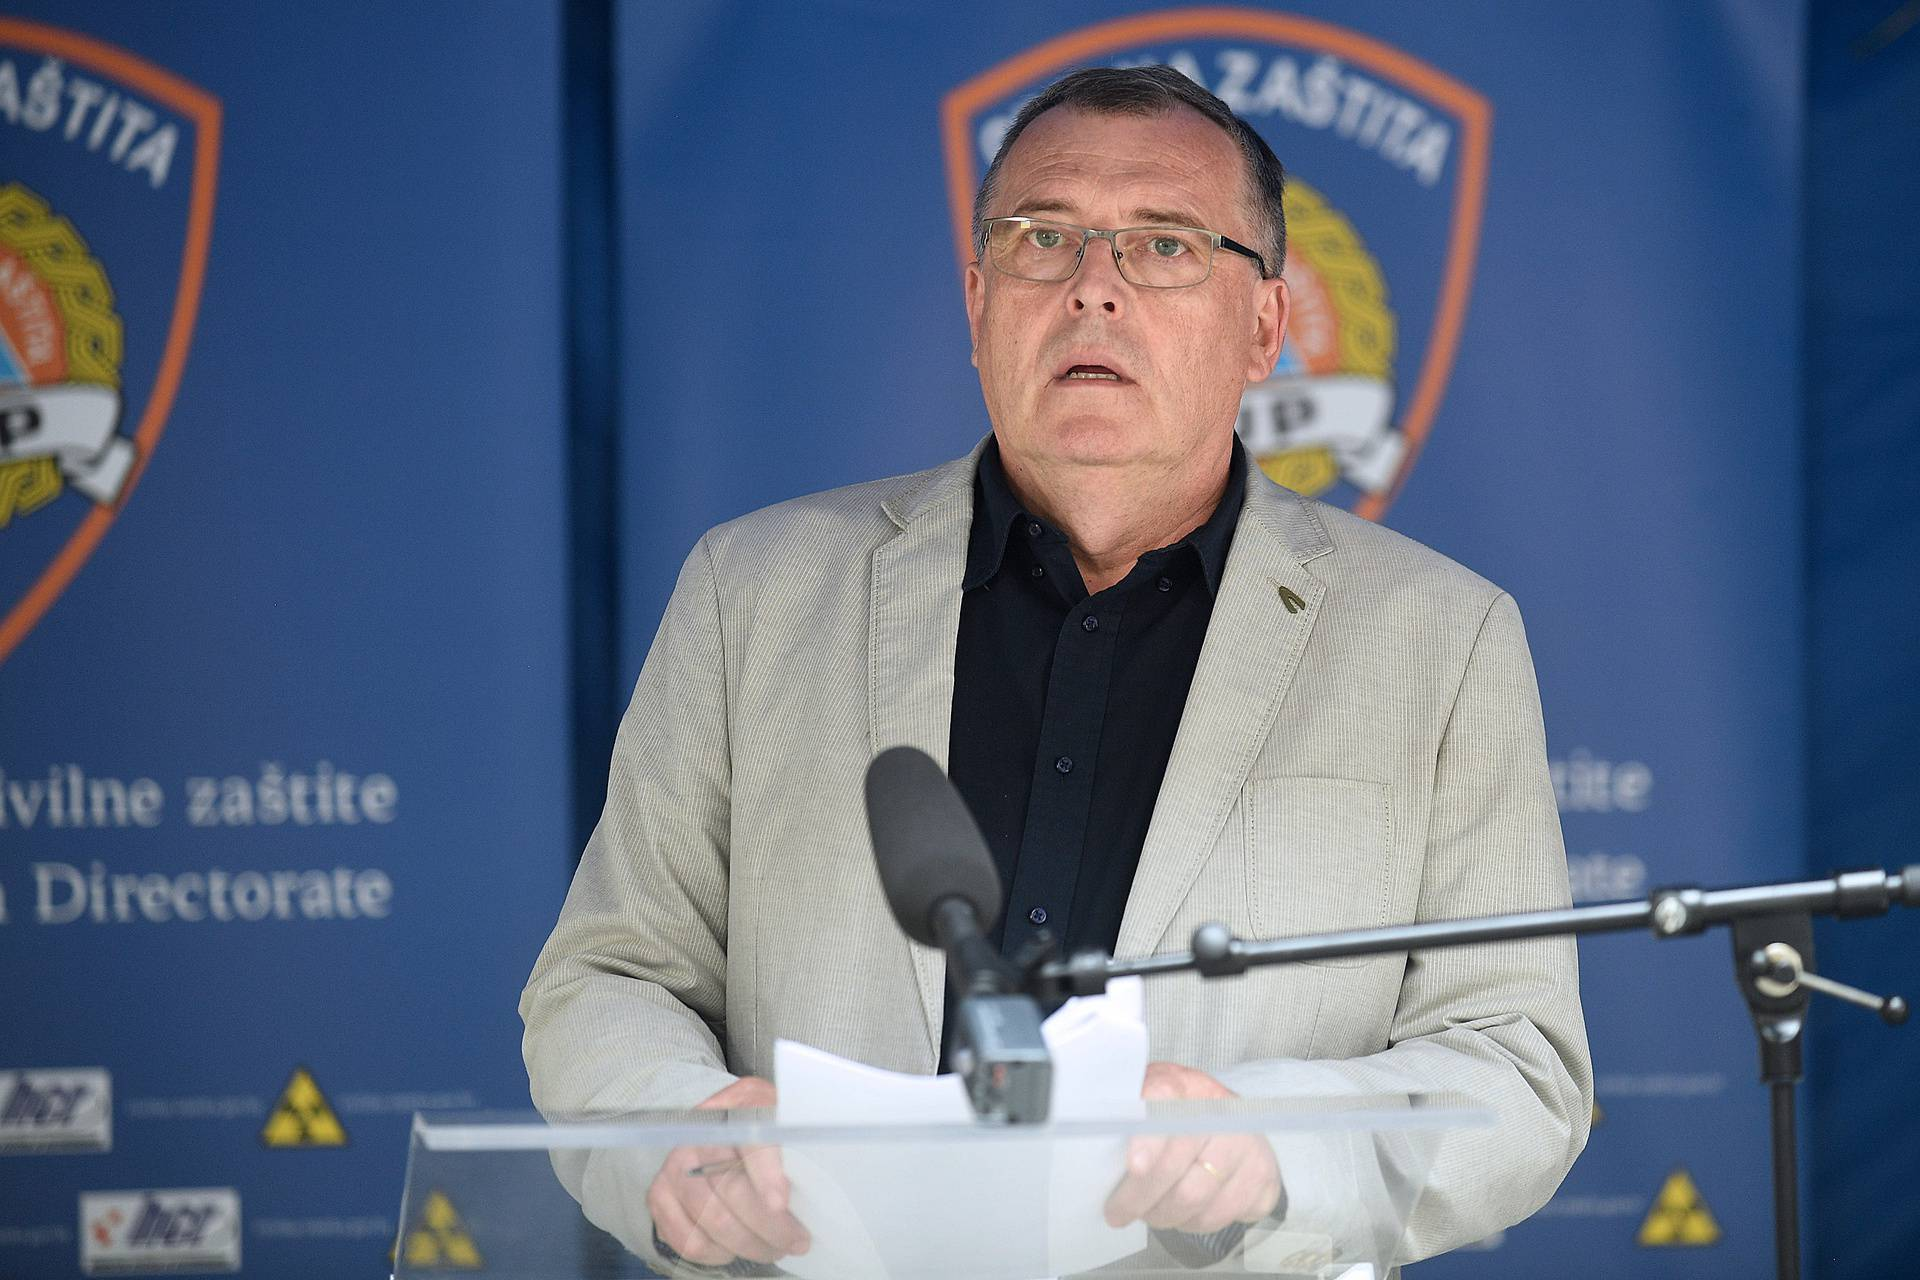 Zagreb: U protekla 24 sata zabilježena 52 nova slučaja zaraze koronavirusom